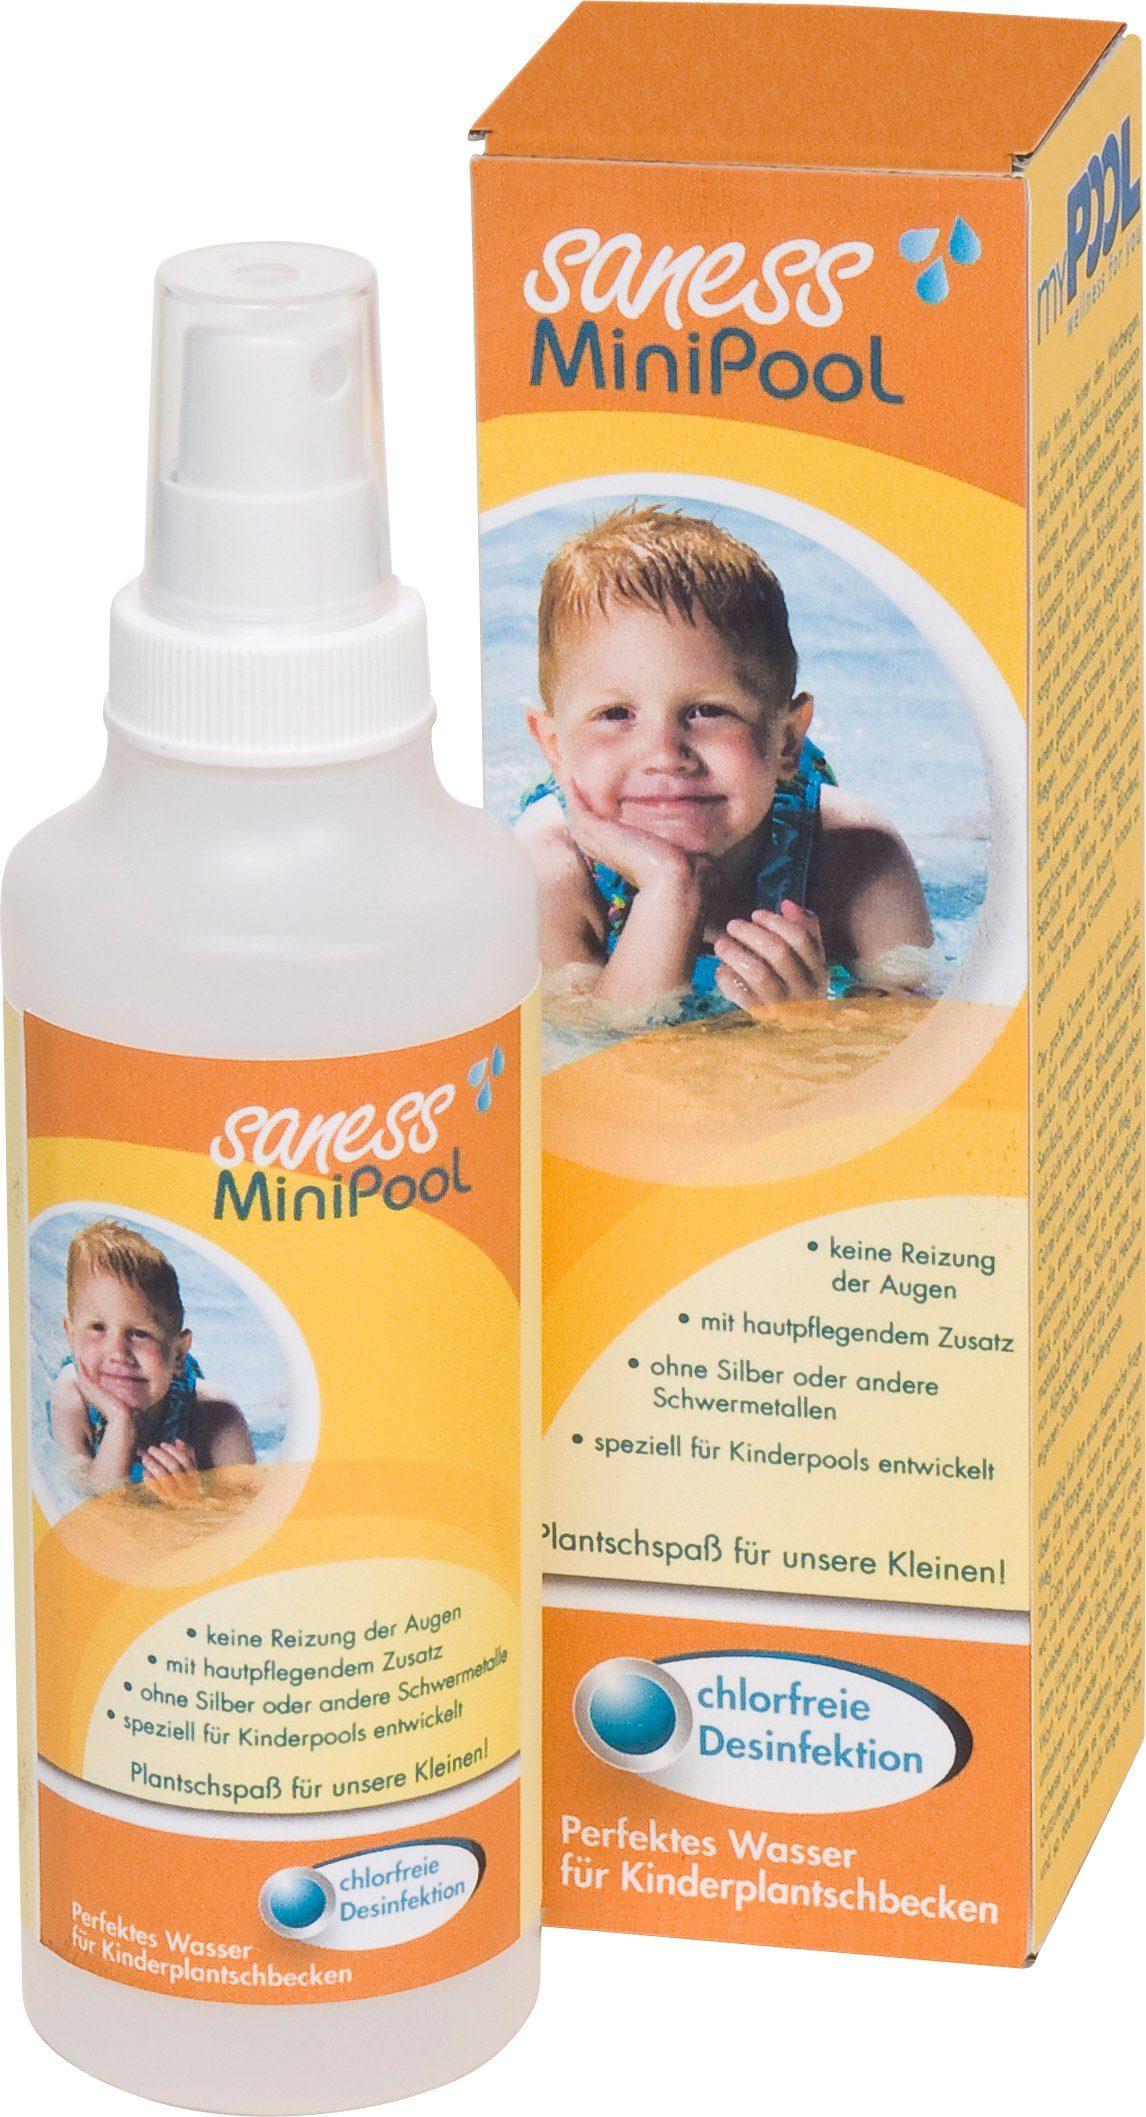 Mypool Wasserpflege »Saness Mini Pool«